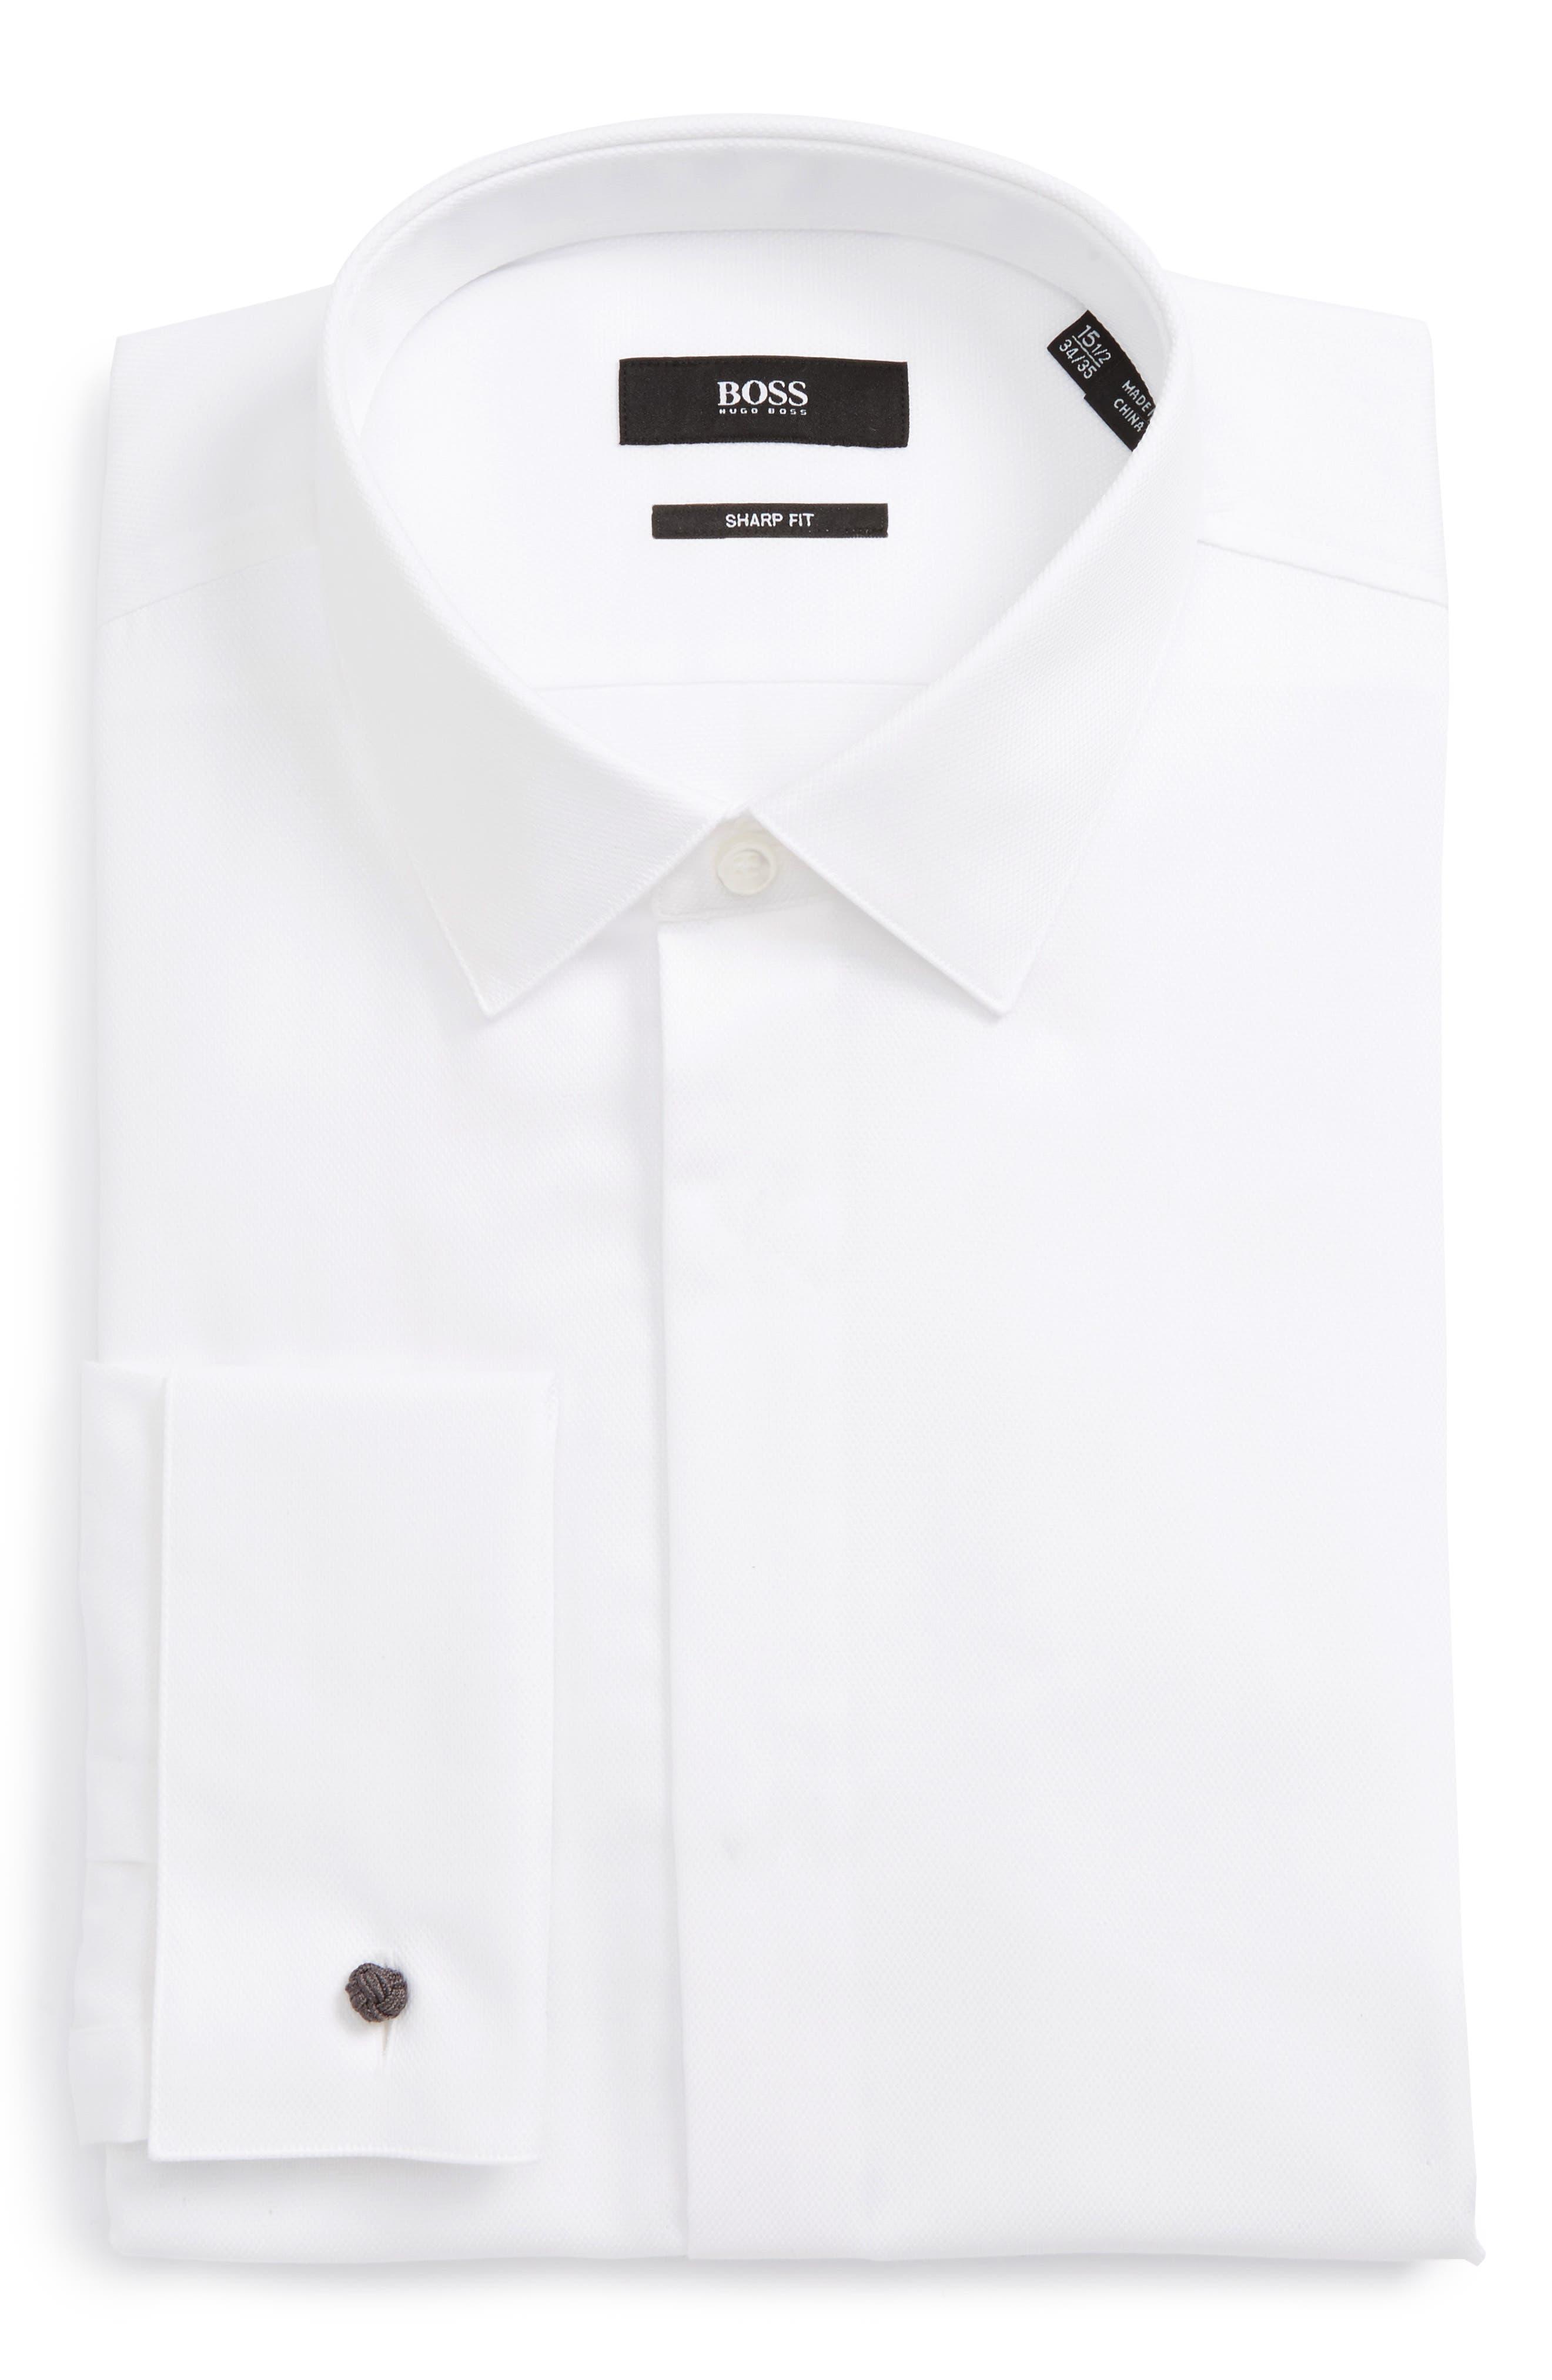 Alternate Image 1 Selected - BOSS Myron Sharp Fit Tuxedo Shirt